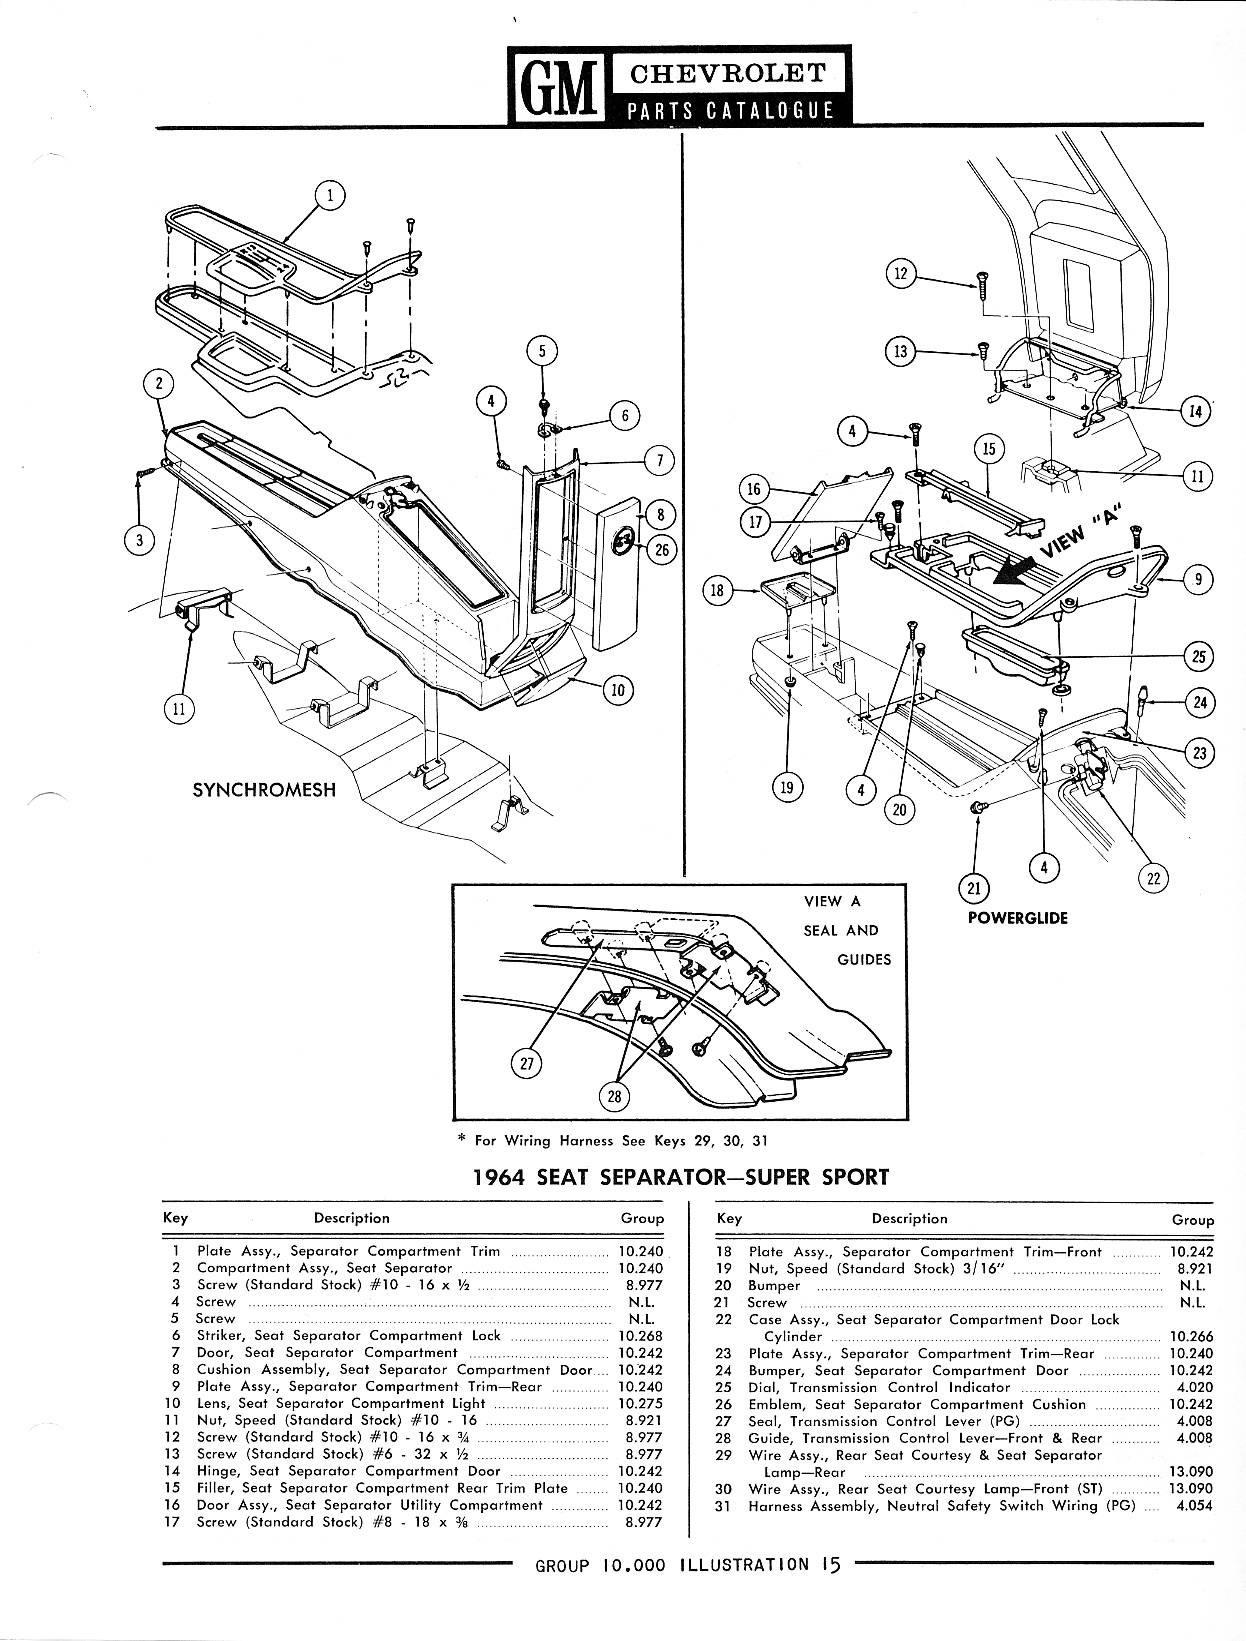 1958-1968 Chevrolet Parts Catalog / Image125.jpg